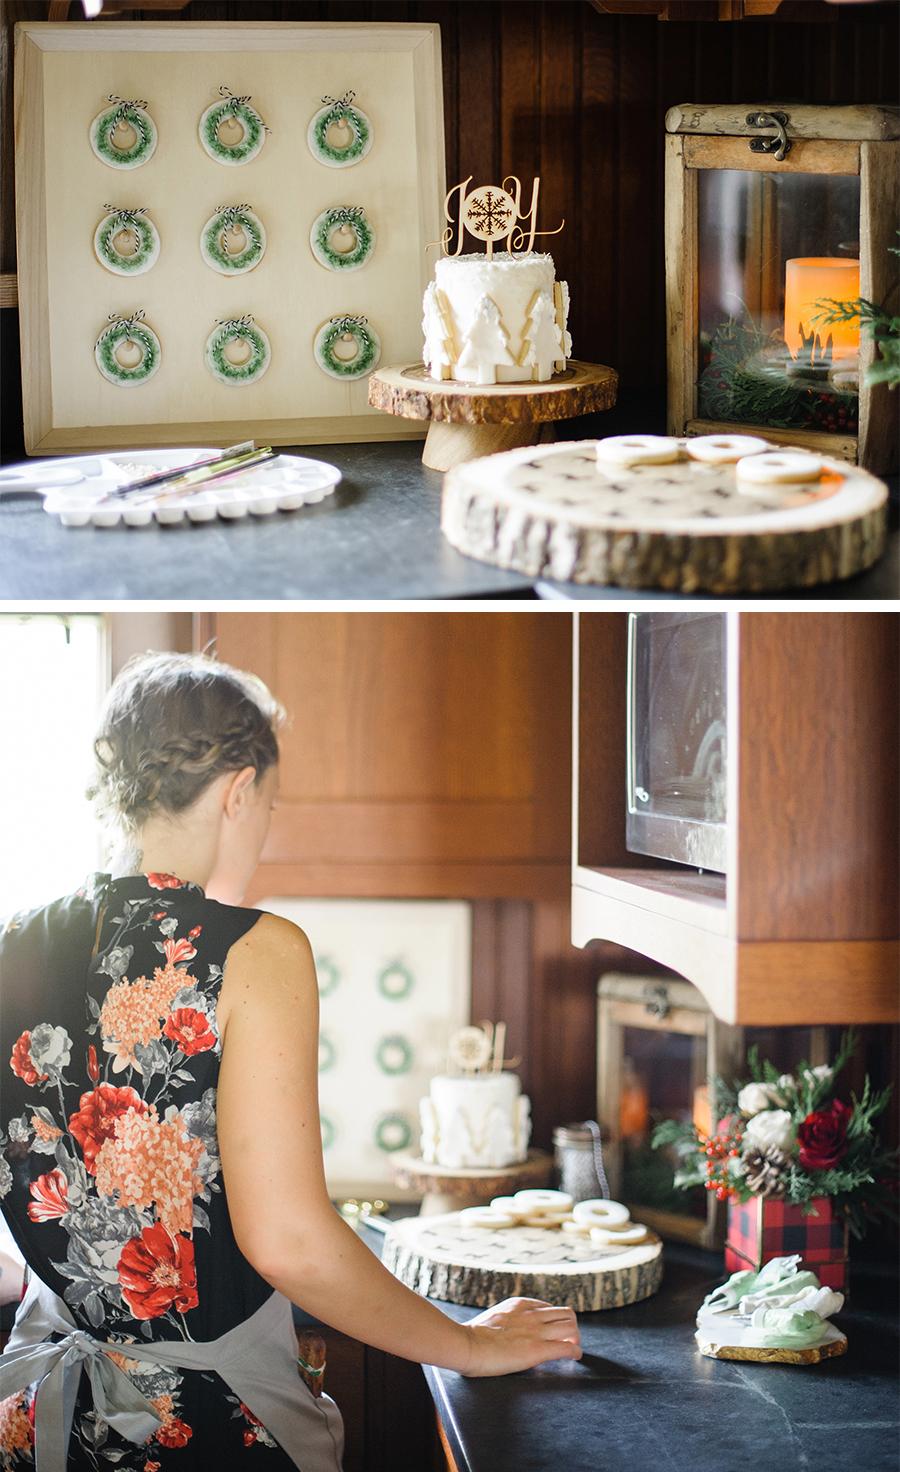 sweet DIY - display board for donuts and cookies | Lorrie Everitt Studio